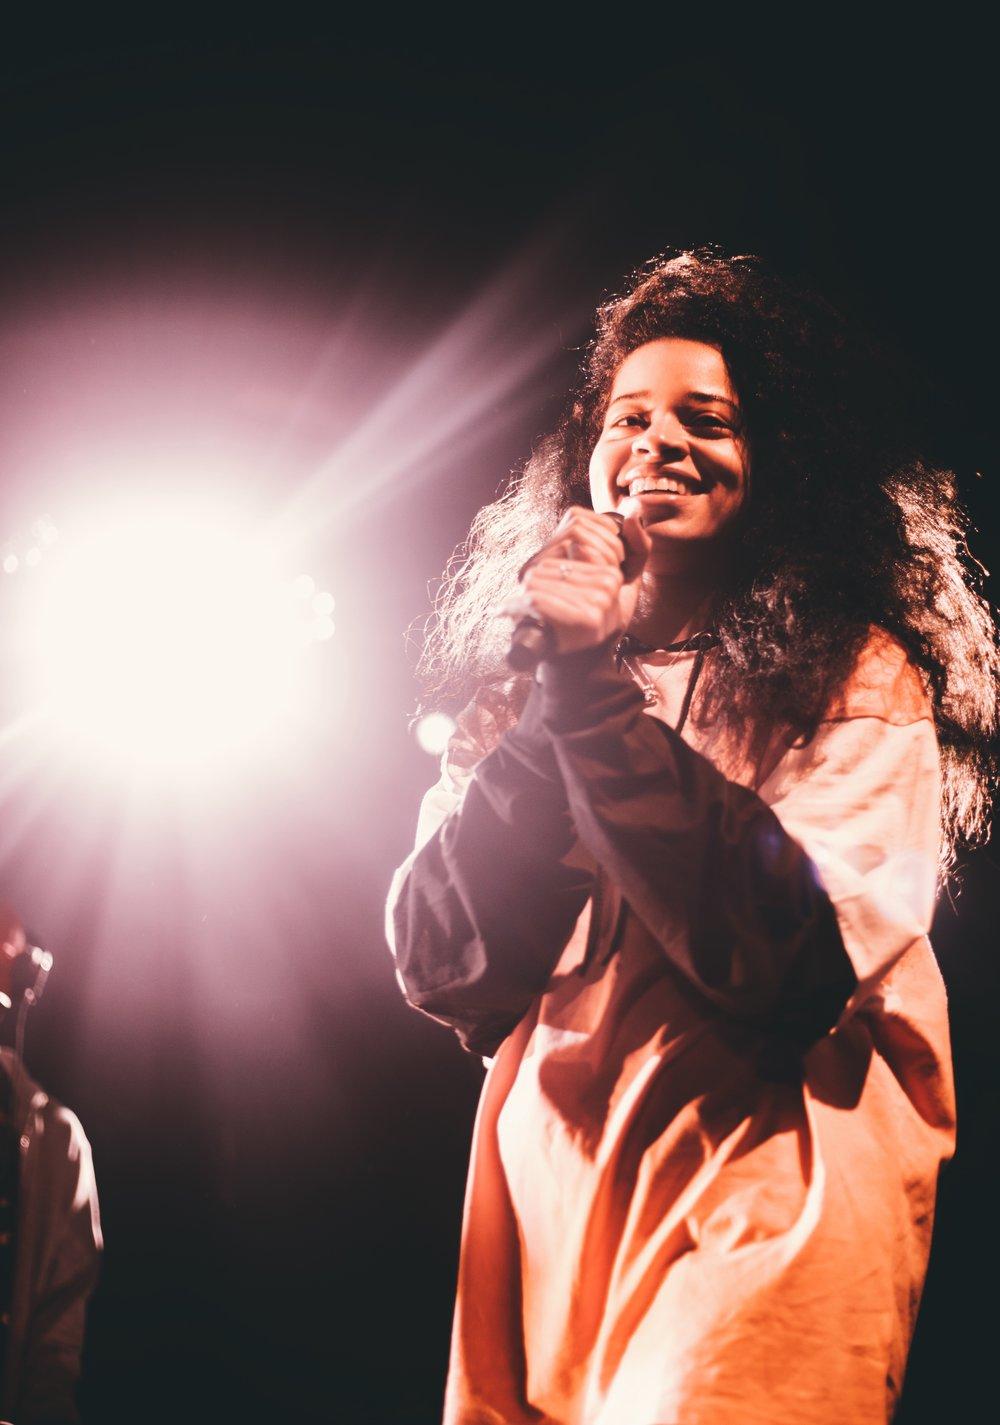 Ella Mai performing at The Royale (Boston, MA)